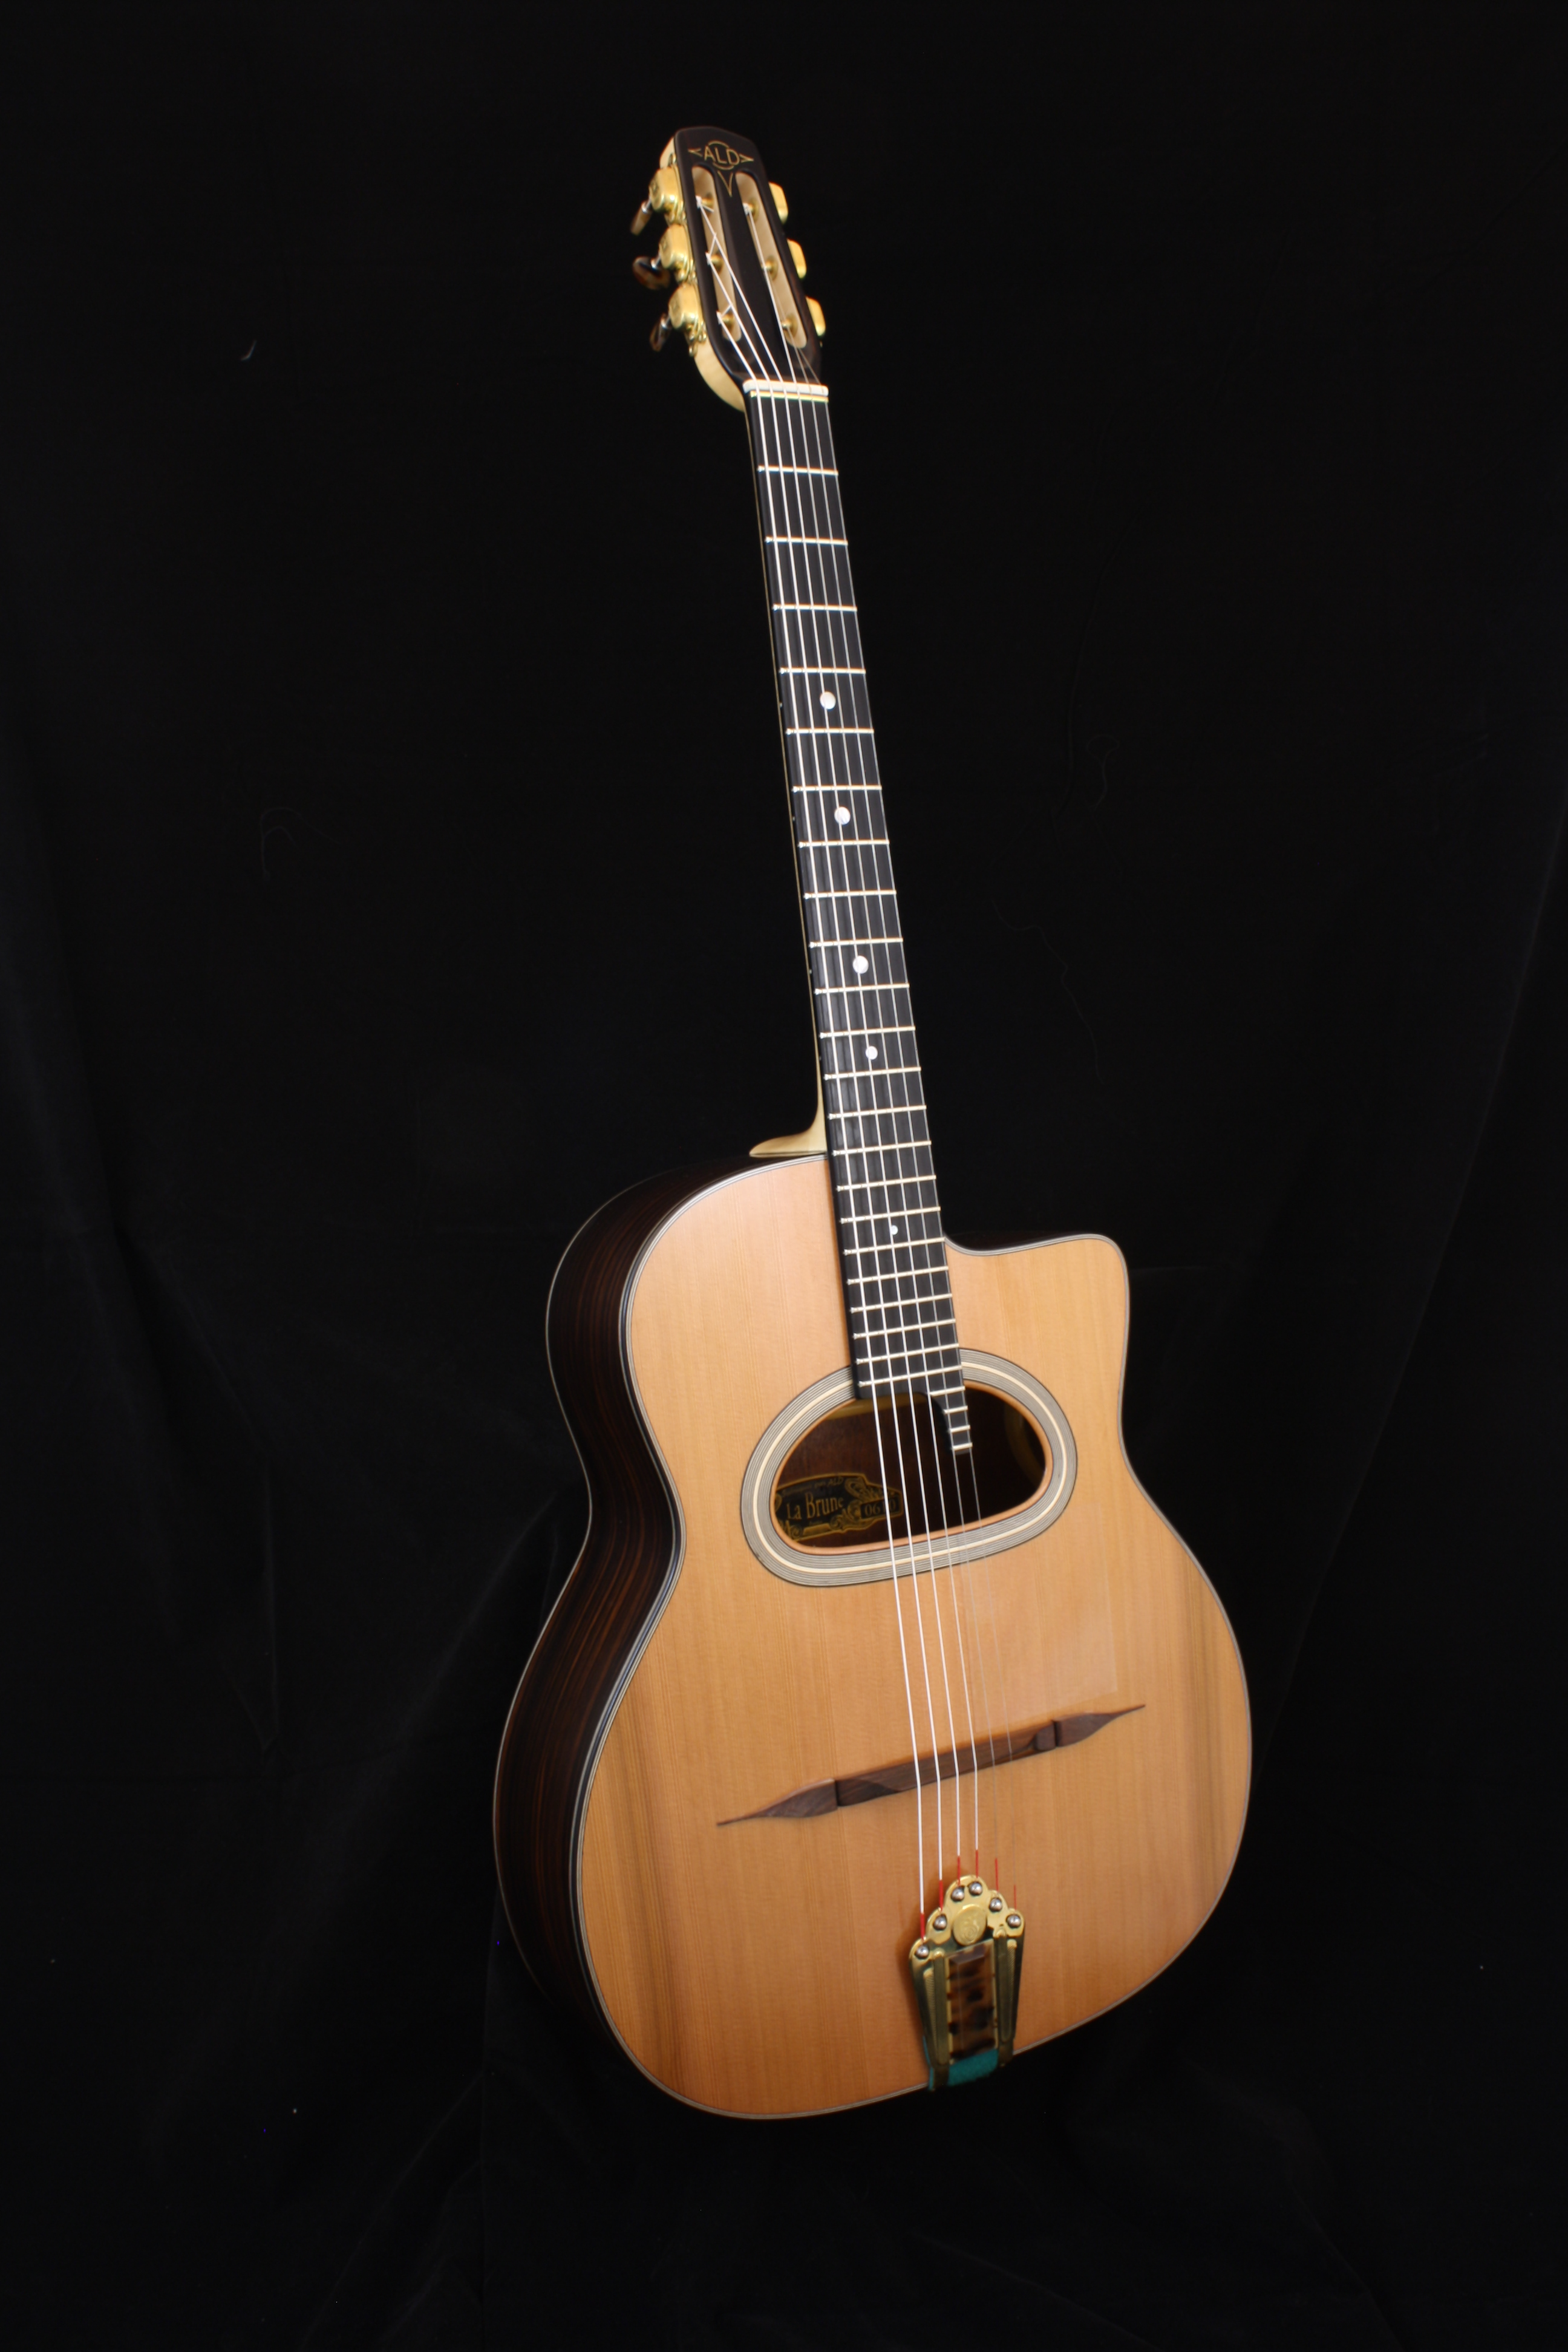 Guitare ALD Brune